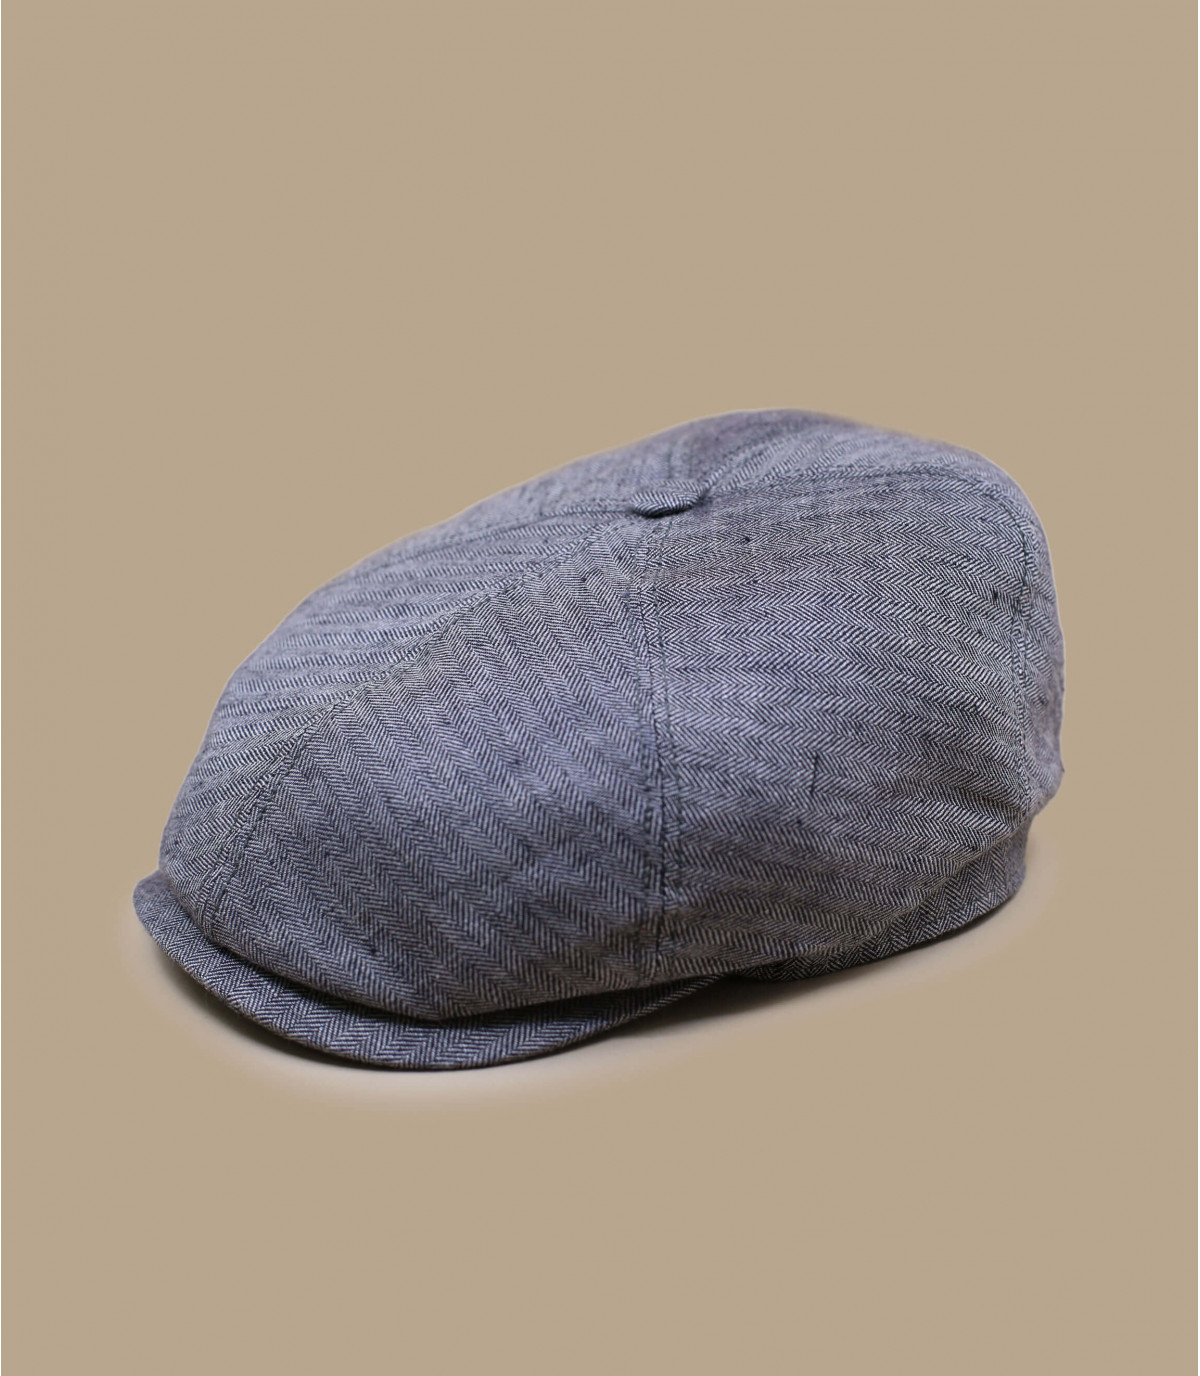 Irish Stetson cap